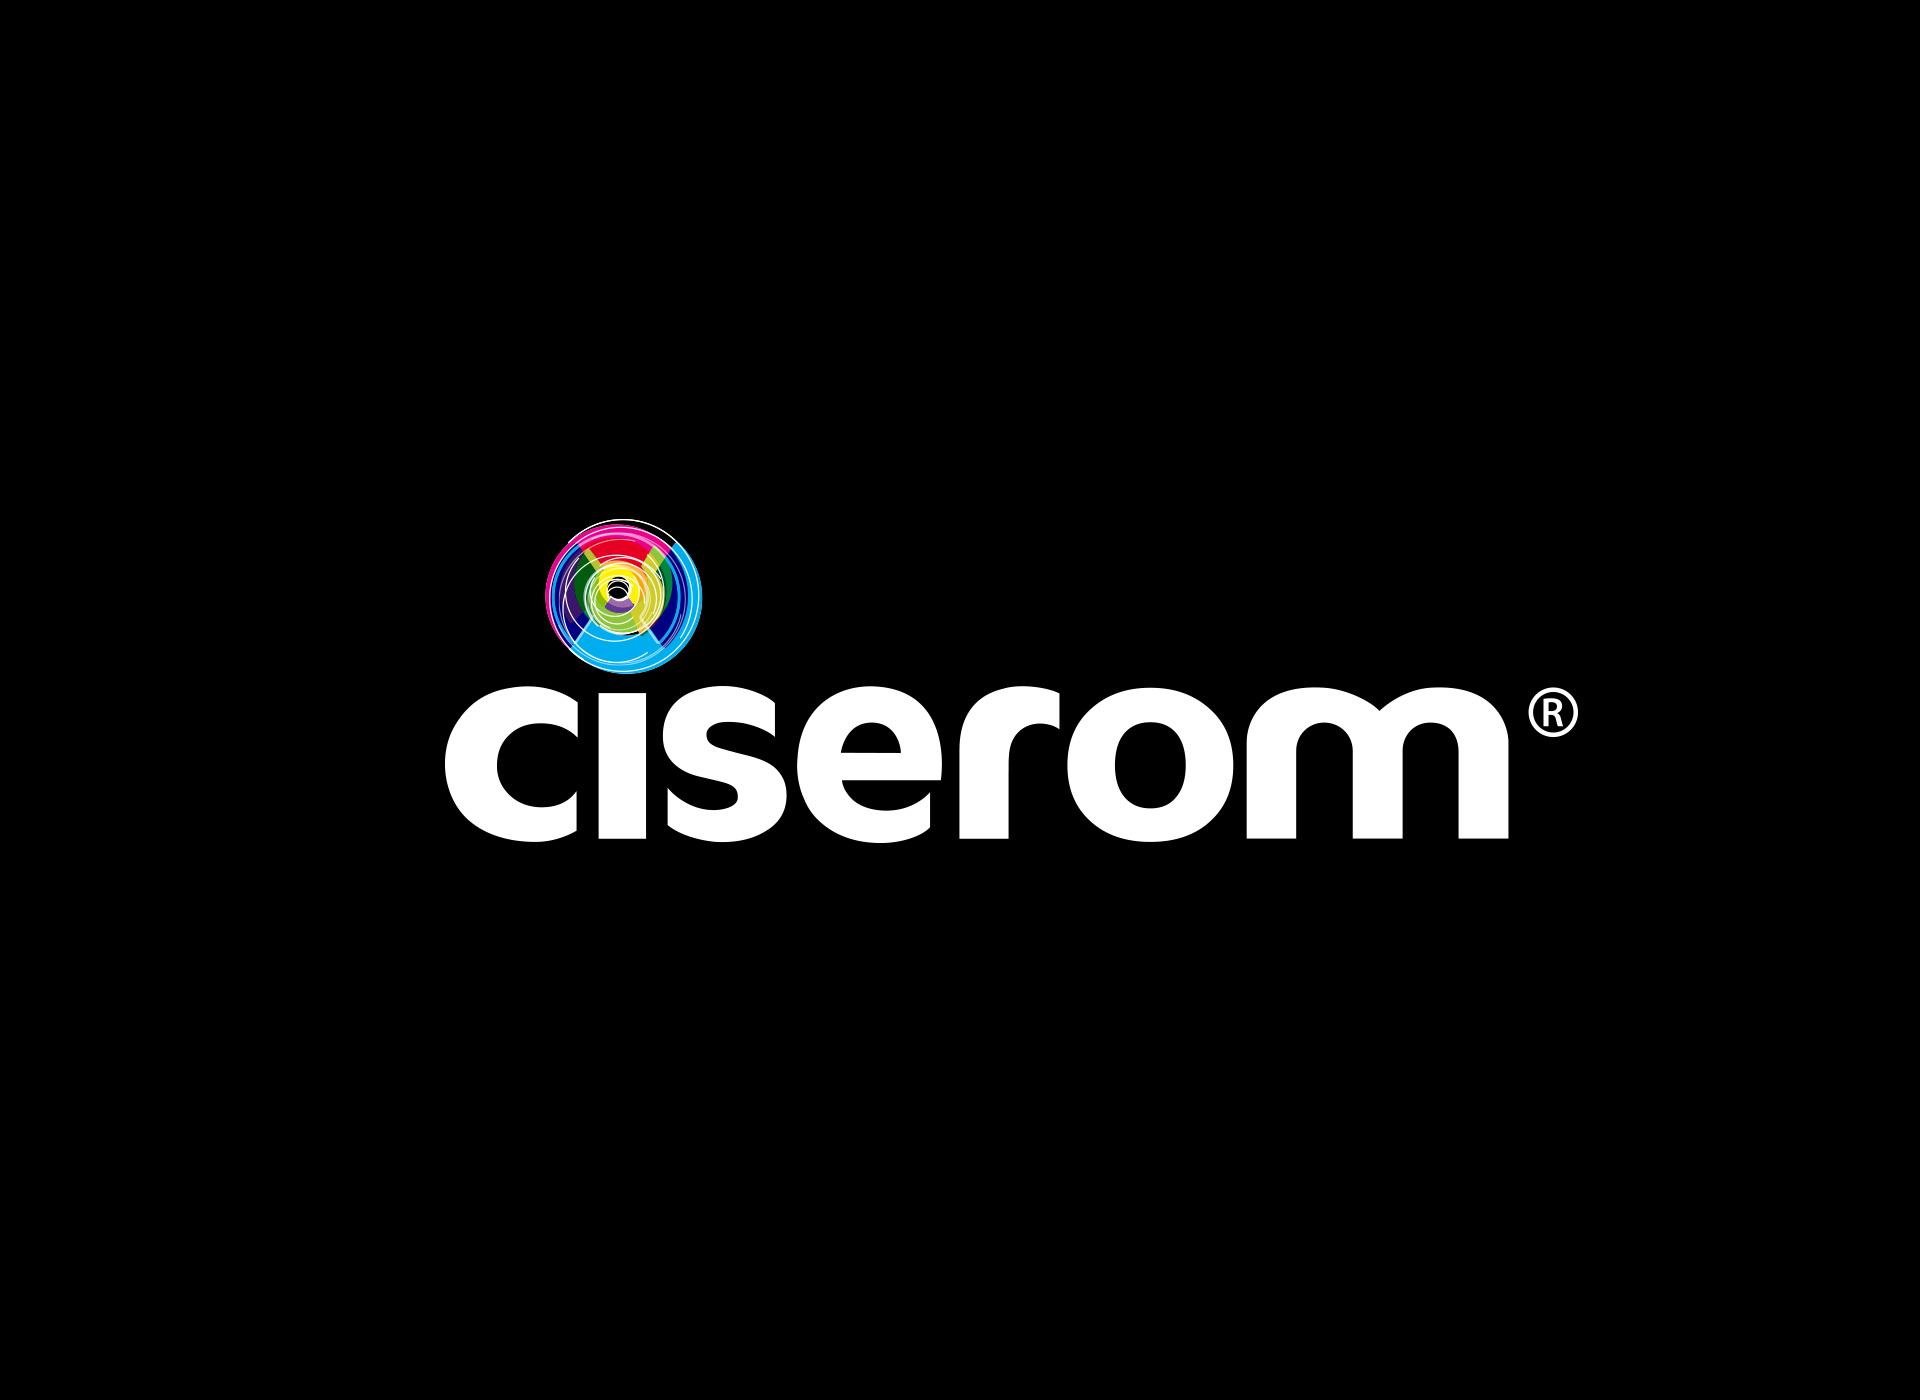 logo ciserom rebranding inoveo